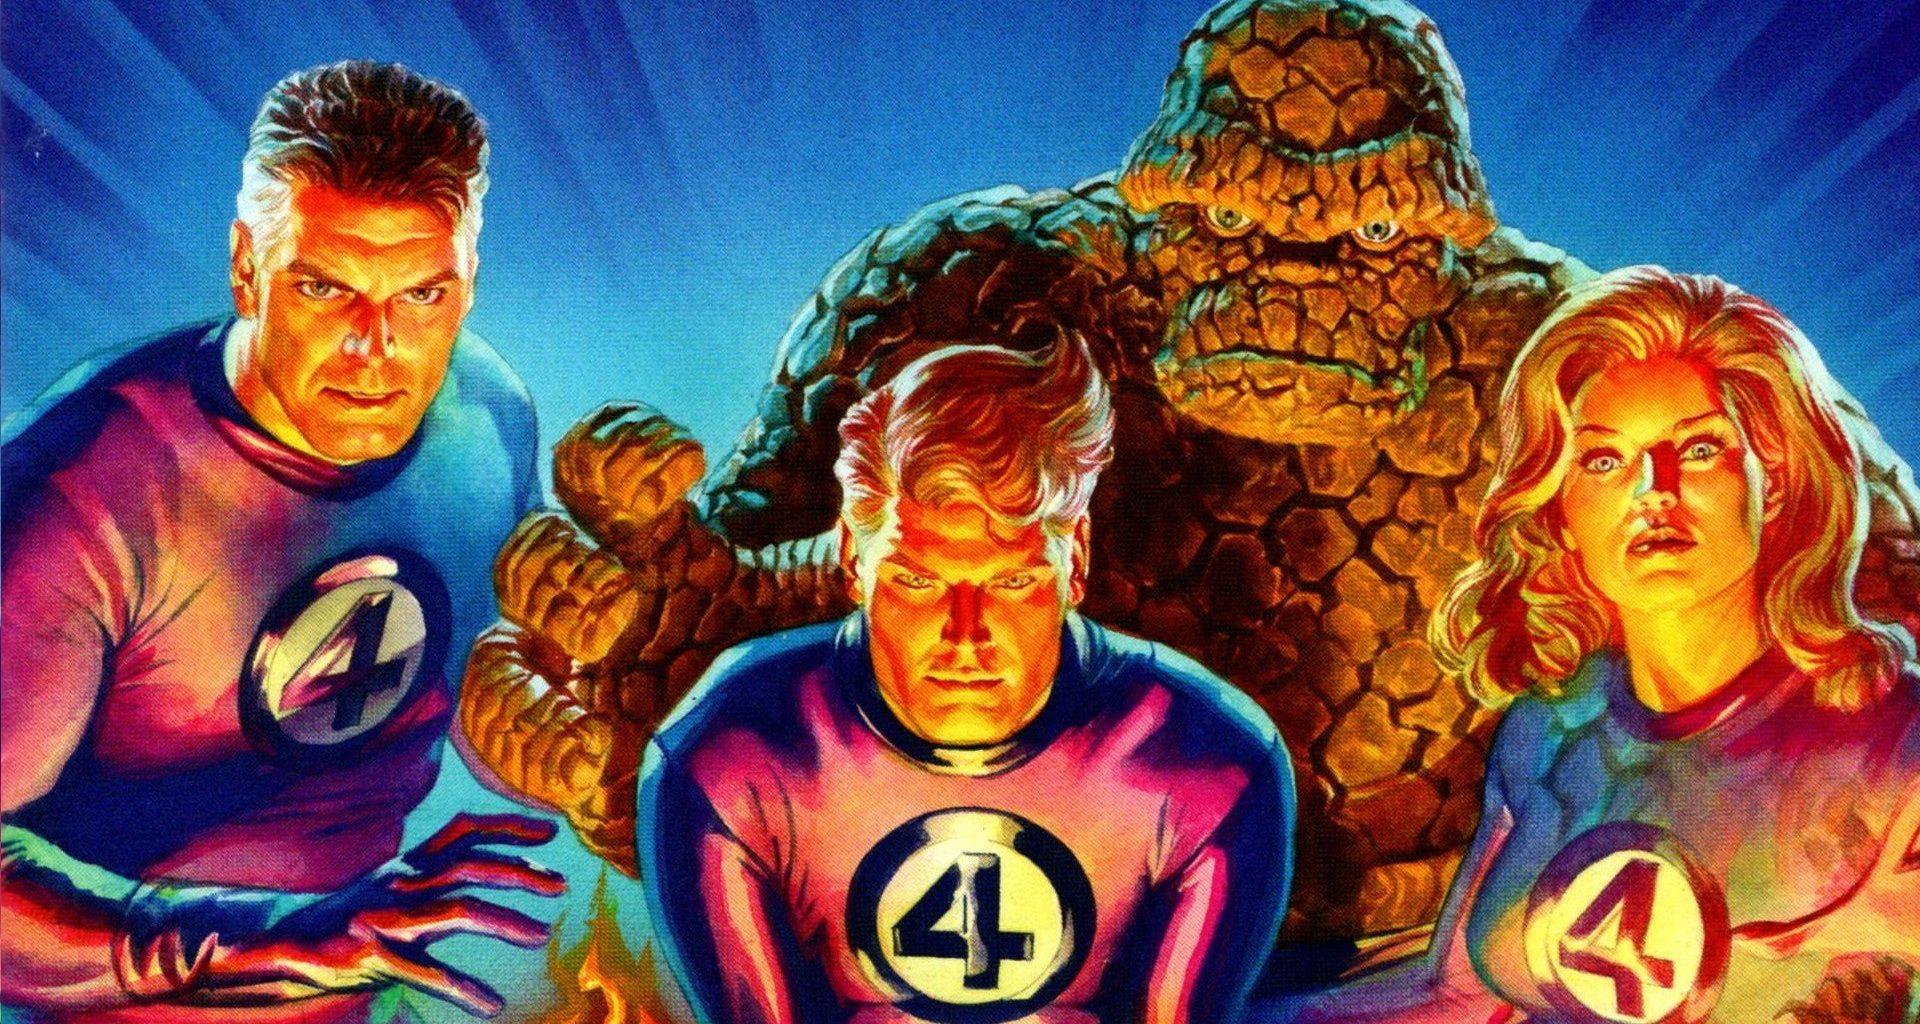 Fantastic Four 1 2018 Alex Ross Variant Cover cover